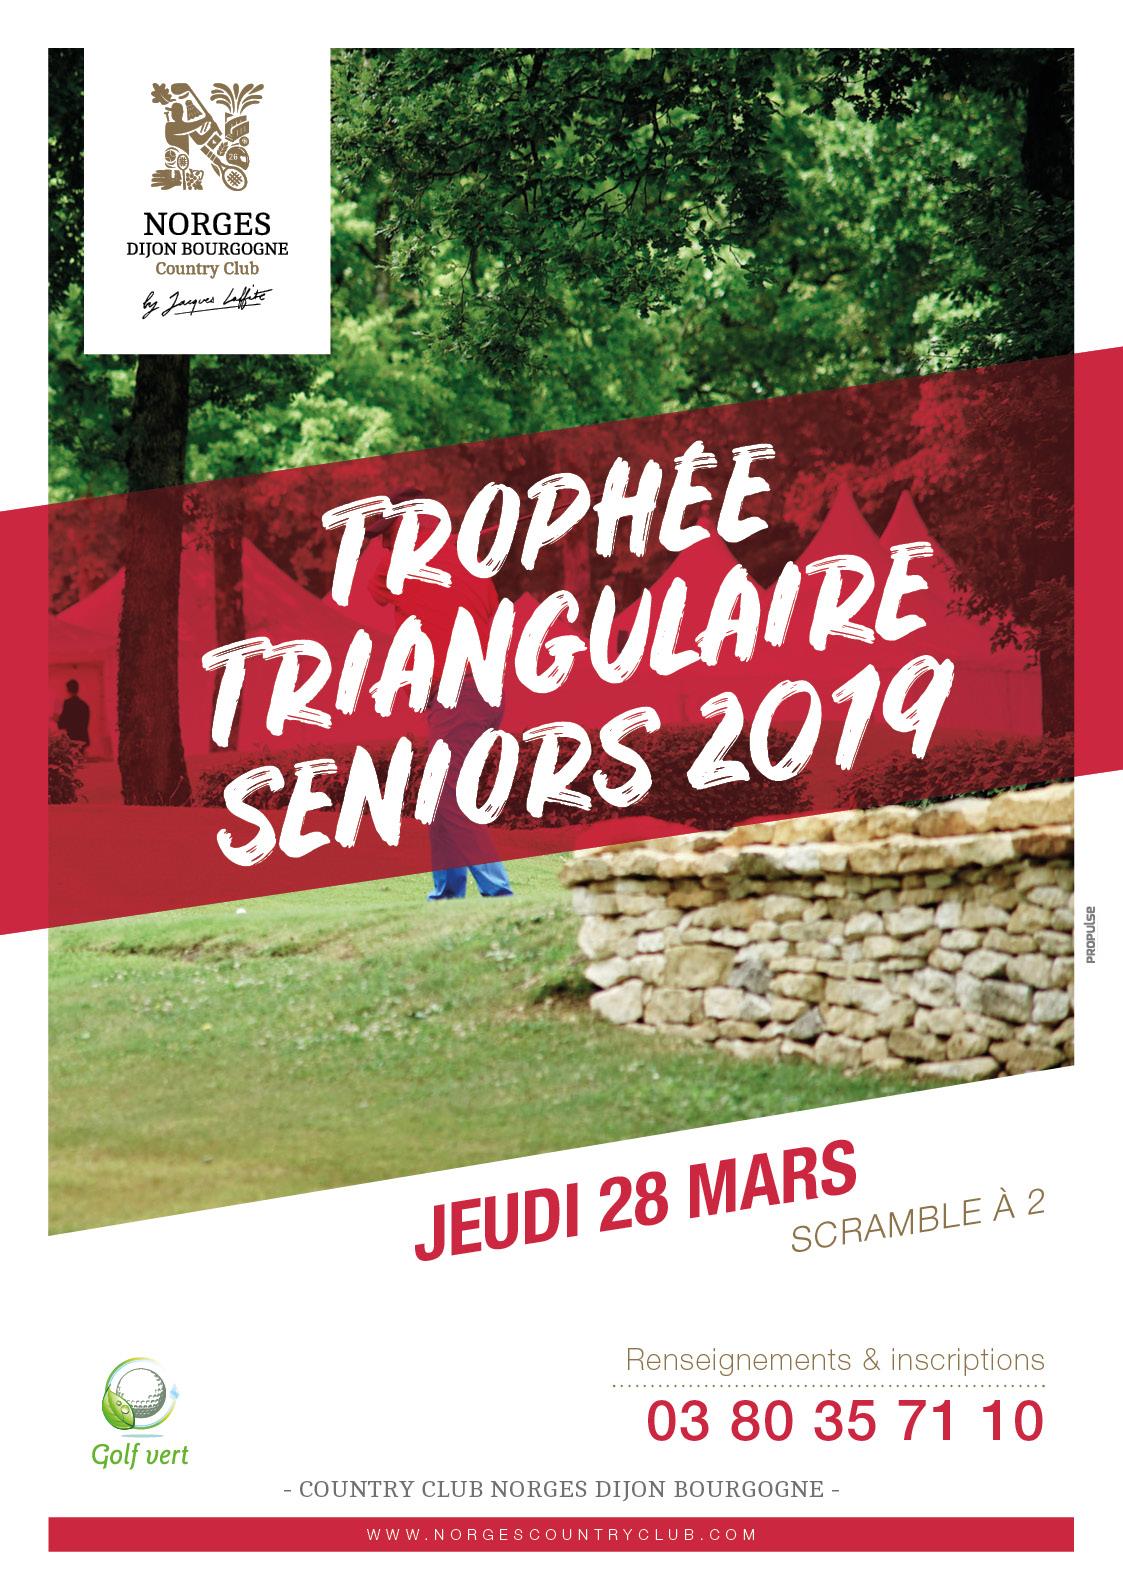 Trophée triangulaire seniors 2019